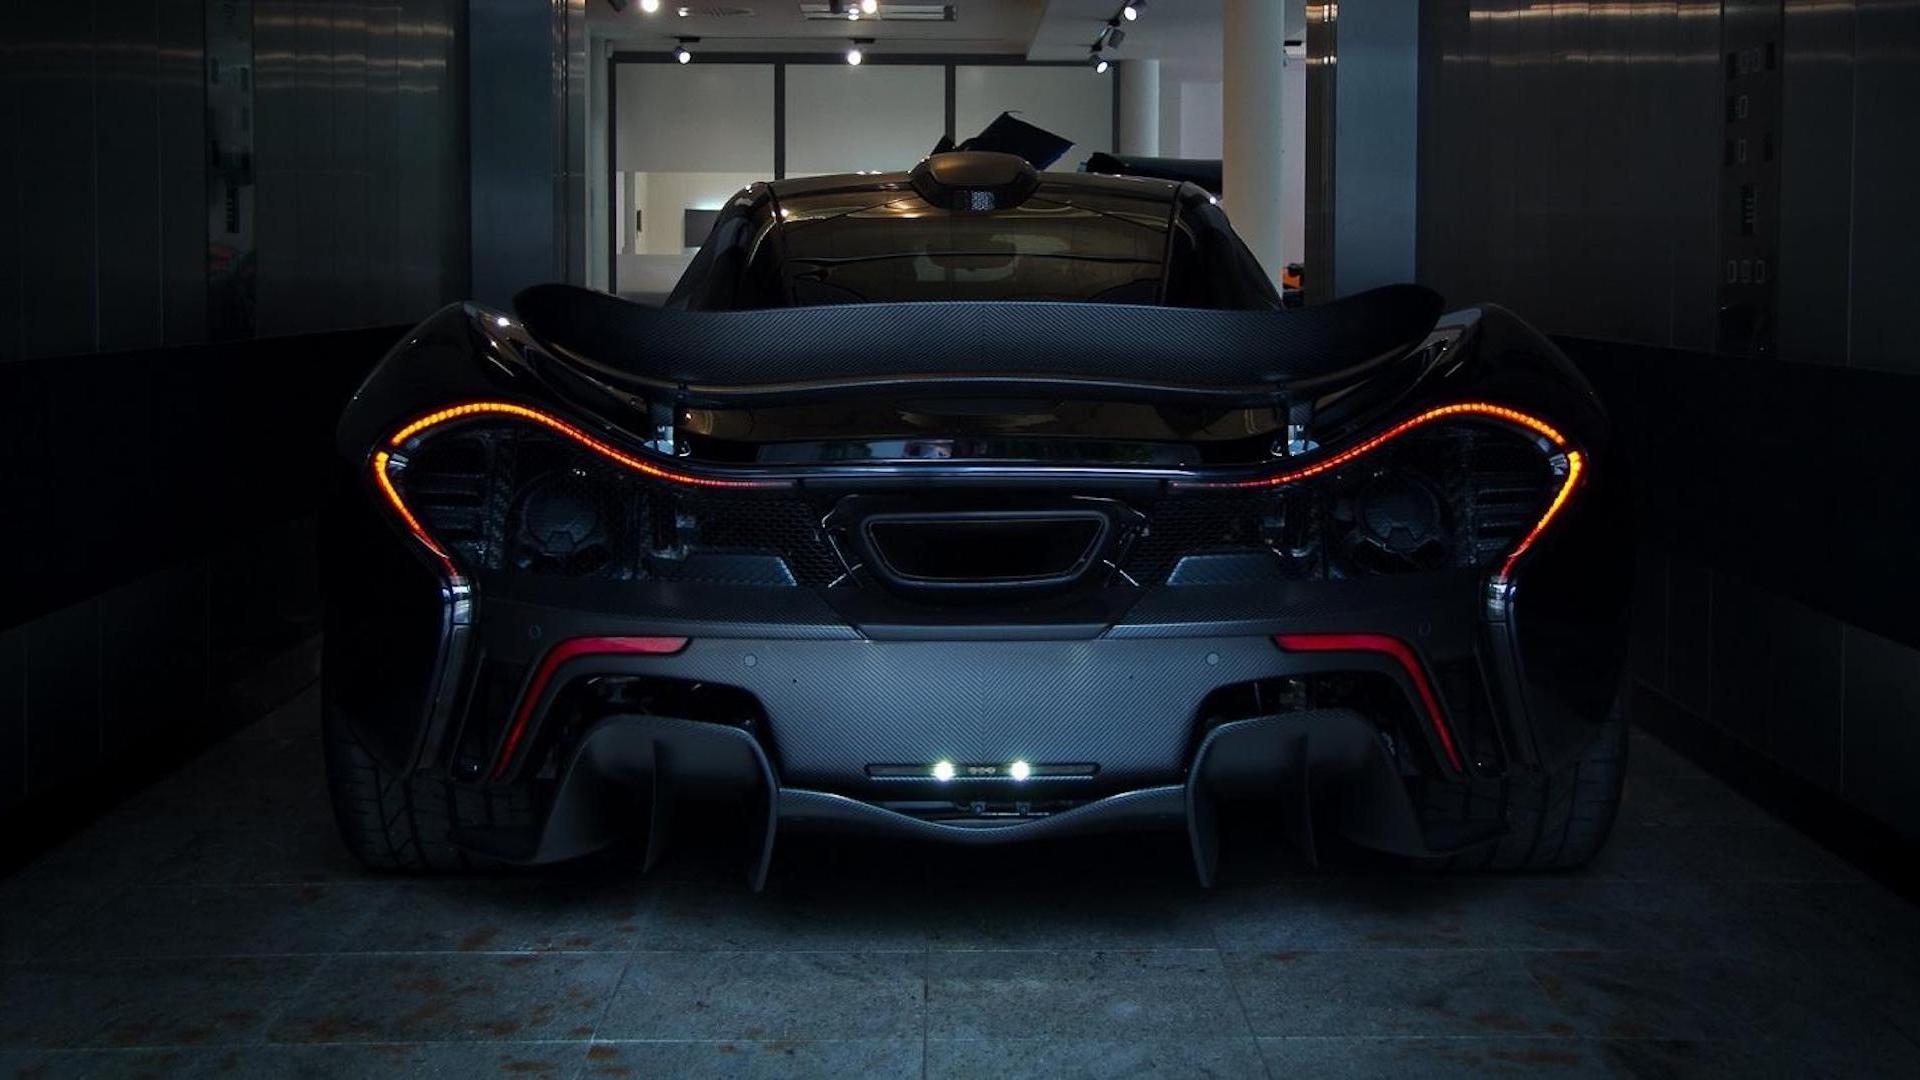 McLaren P1 SCHWARZ Slideshow